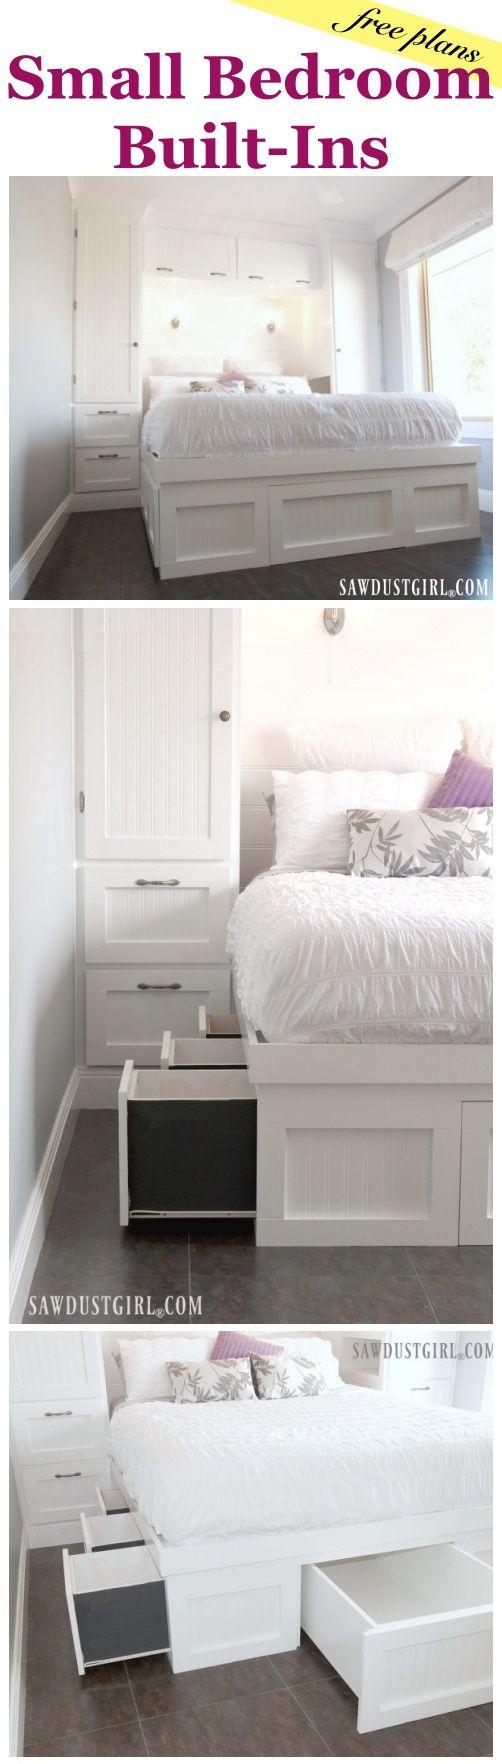 Platform Storage Bed and Wardrobes - free plans!